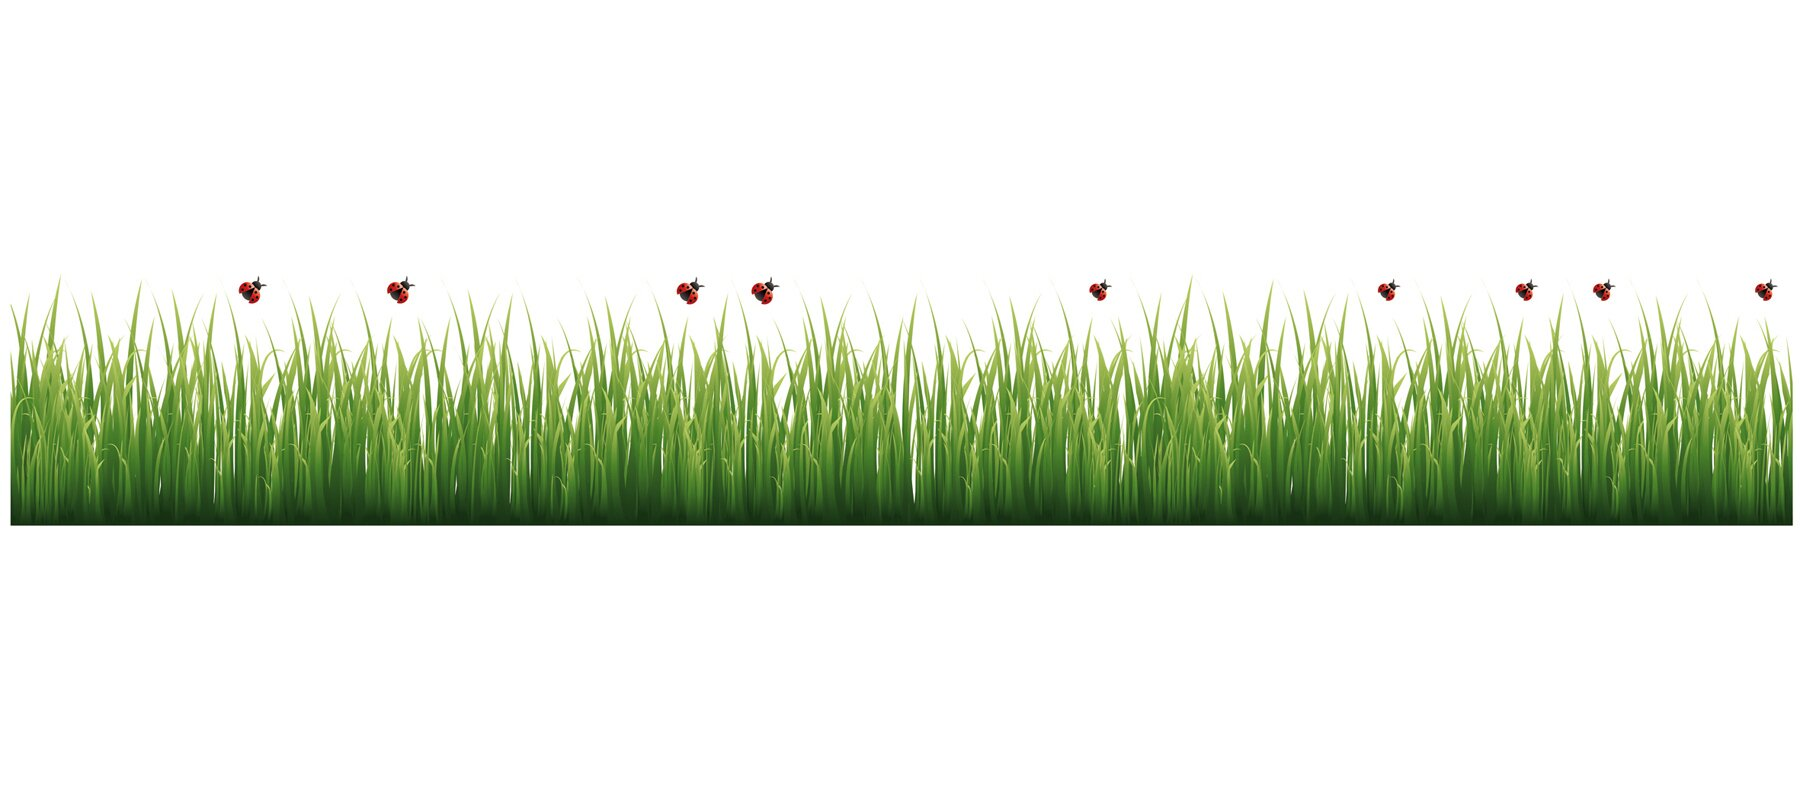 wallpops grass and ladybugs border wall decal reviews wayfair default name